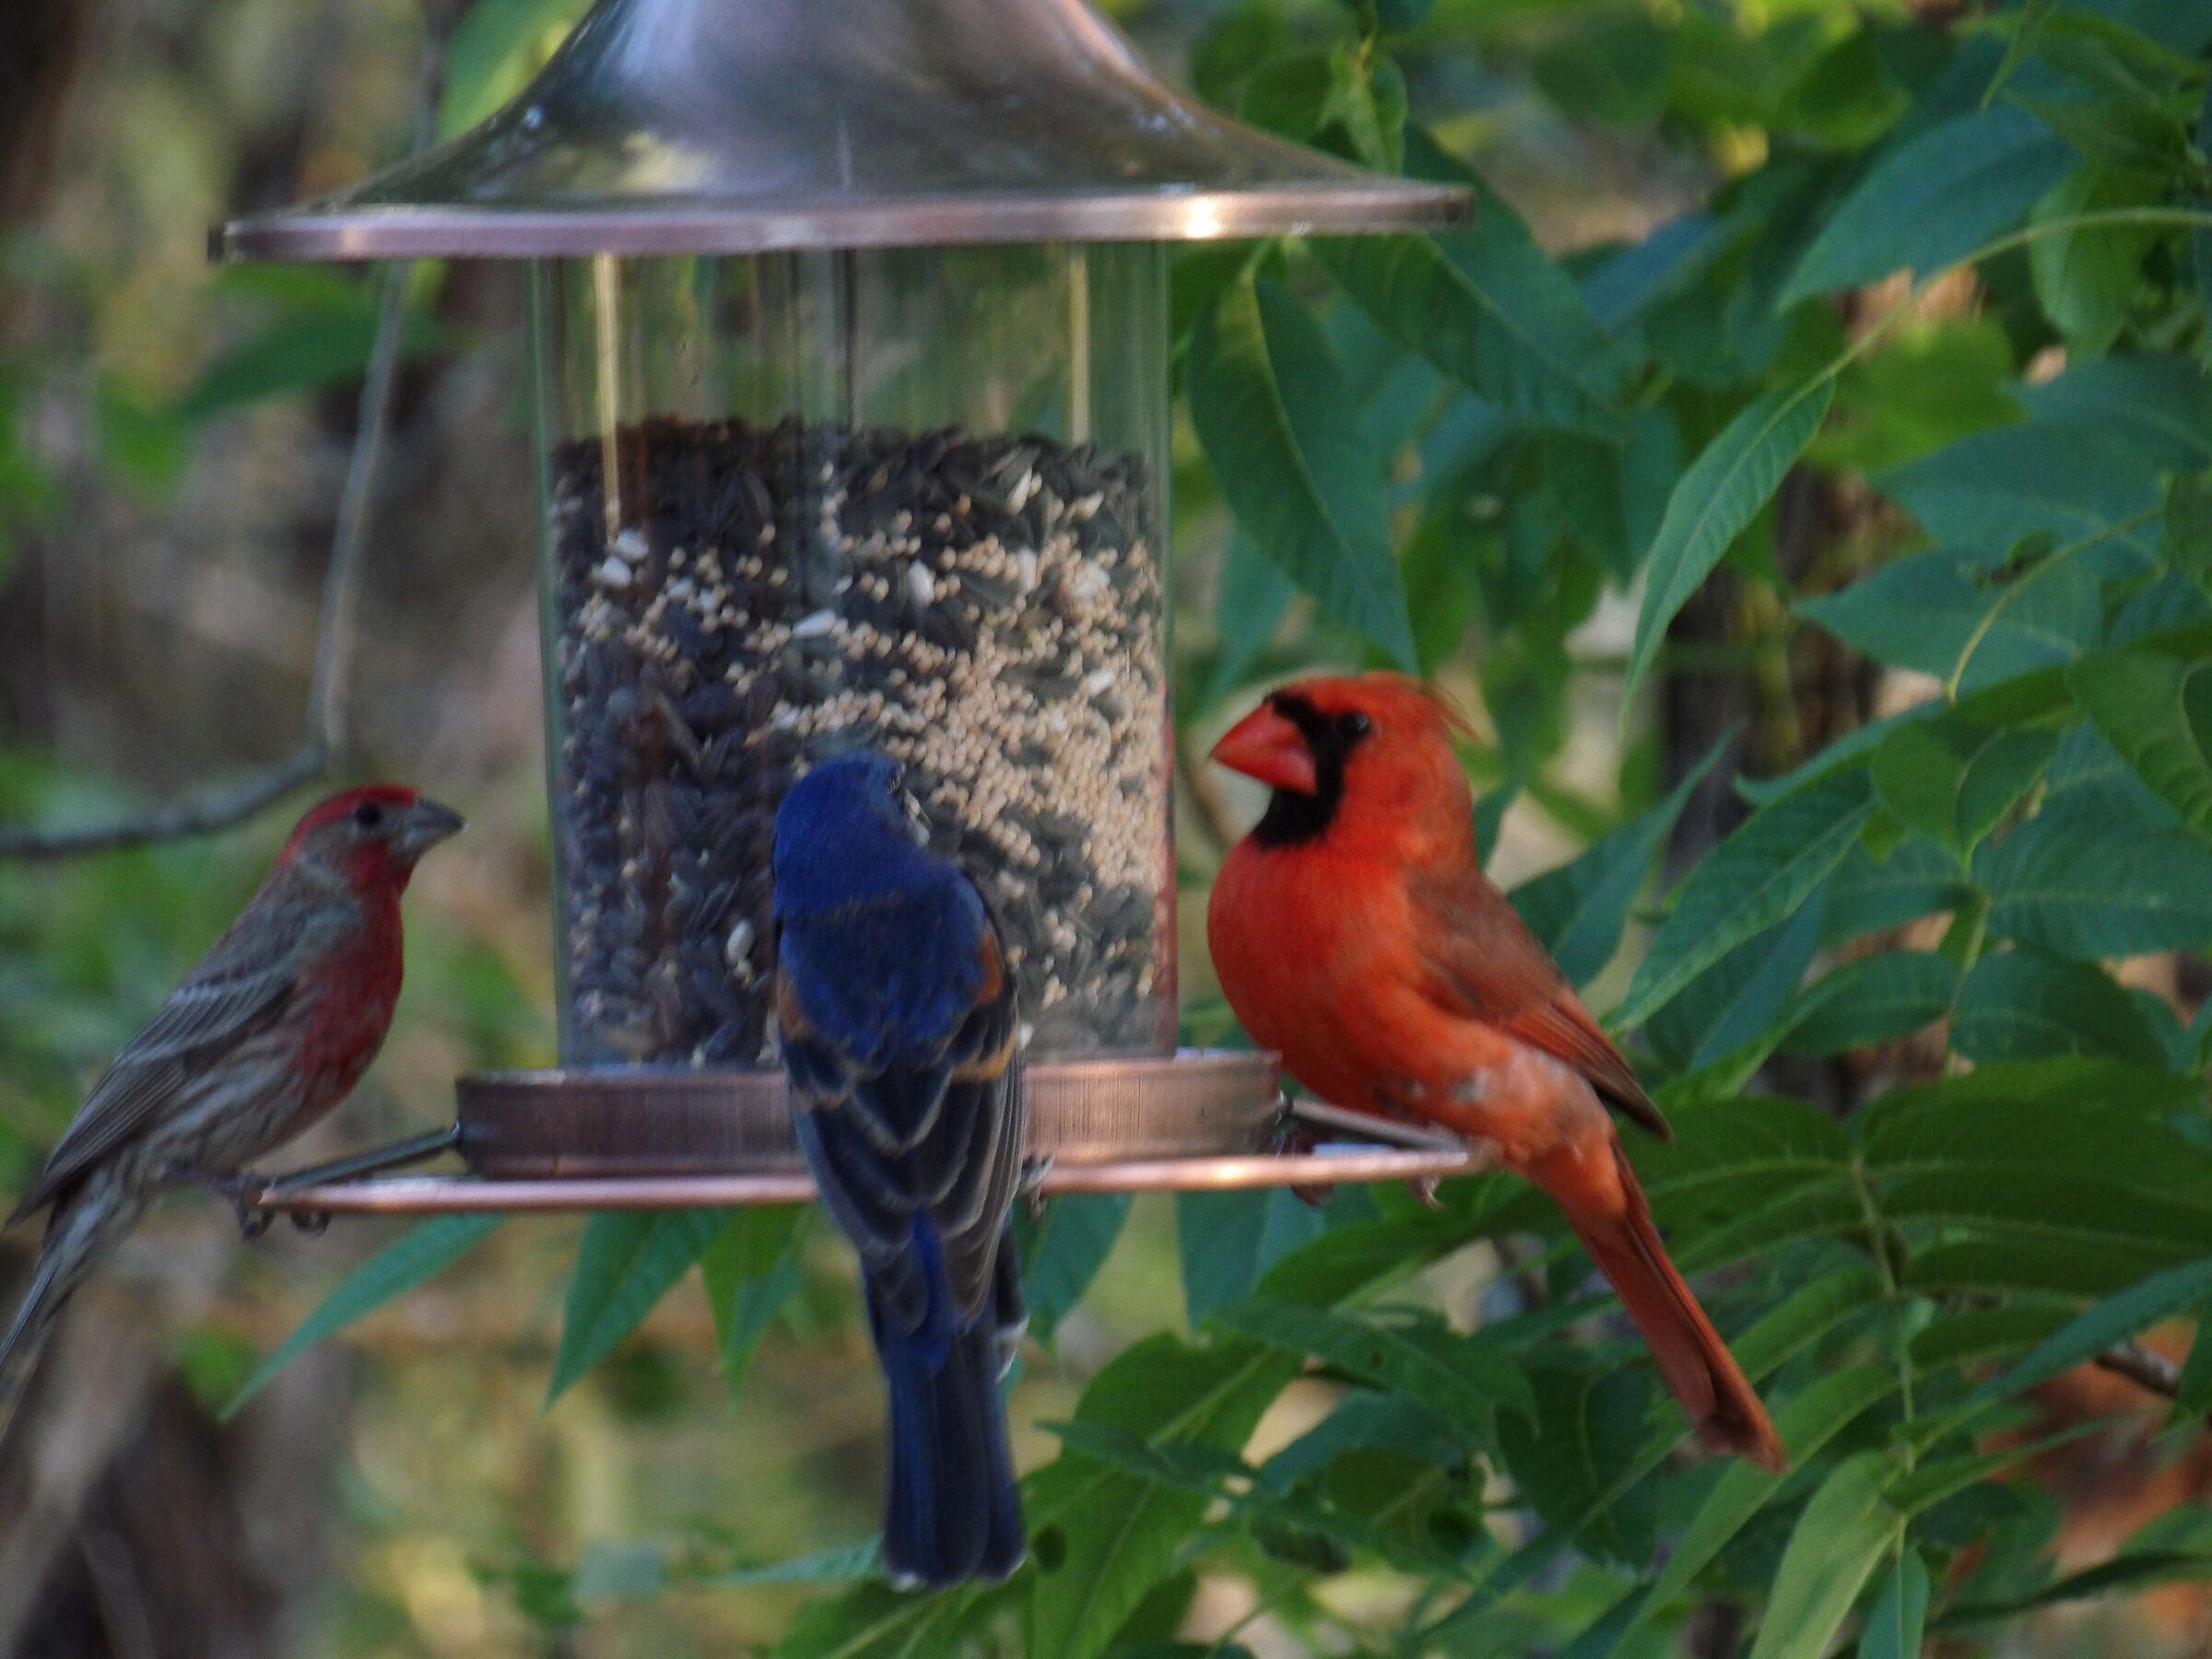 birds in the wild...